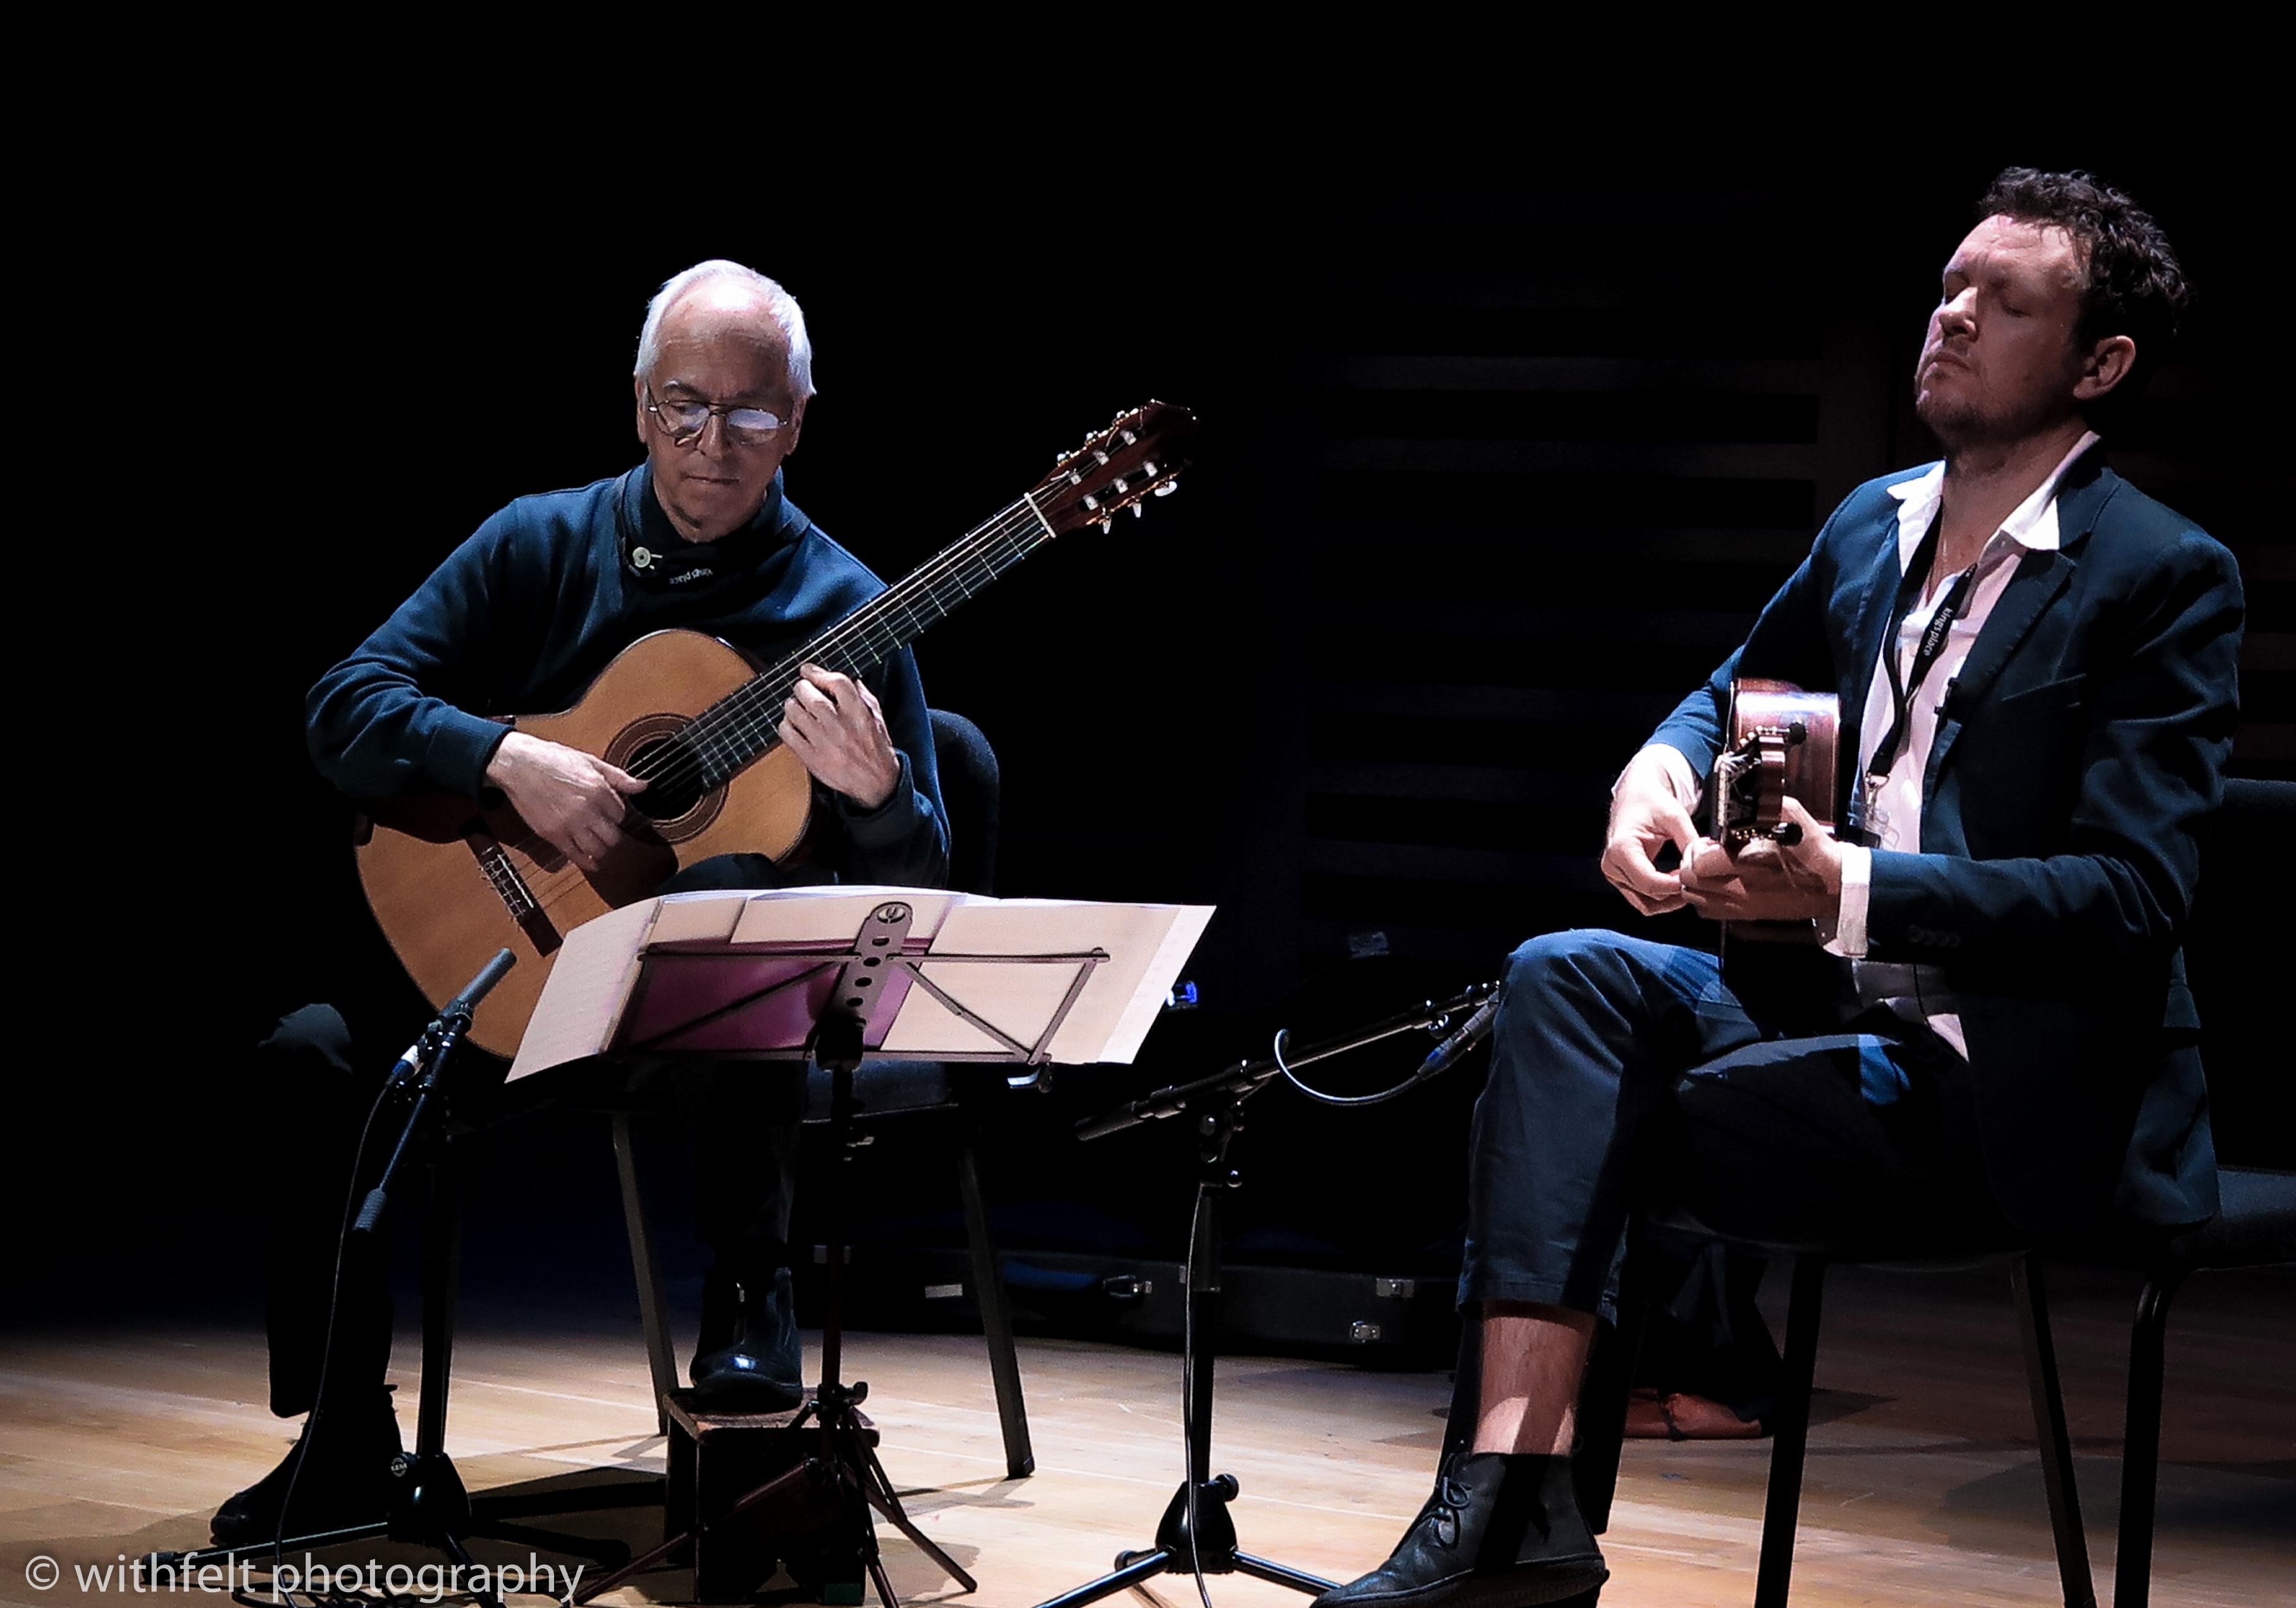 John Williams & Derek Gripper at Songlines Encounters, Kings Place, London 3 jun 2016